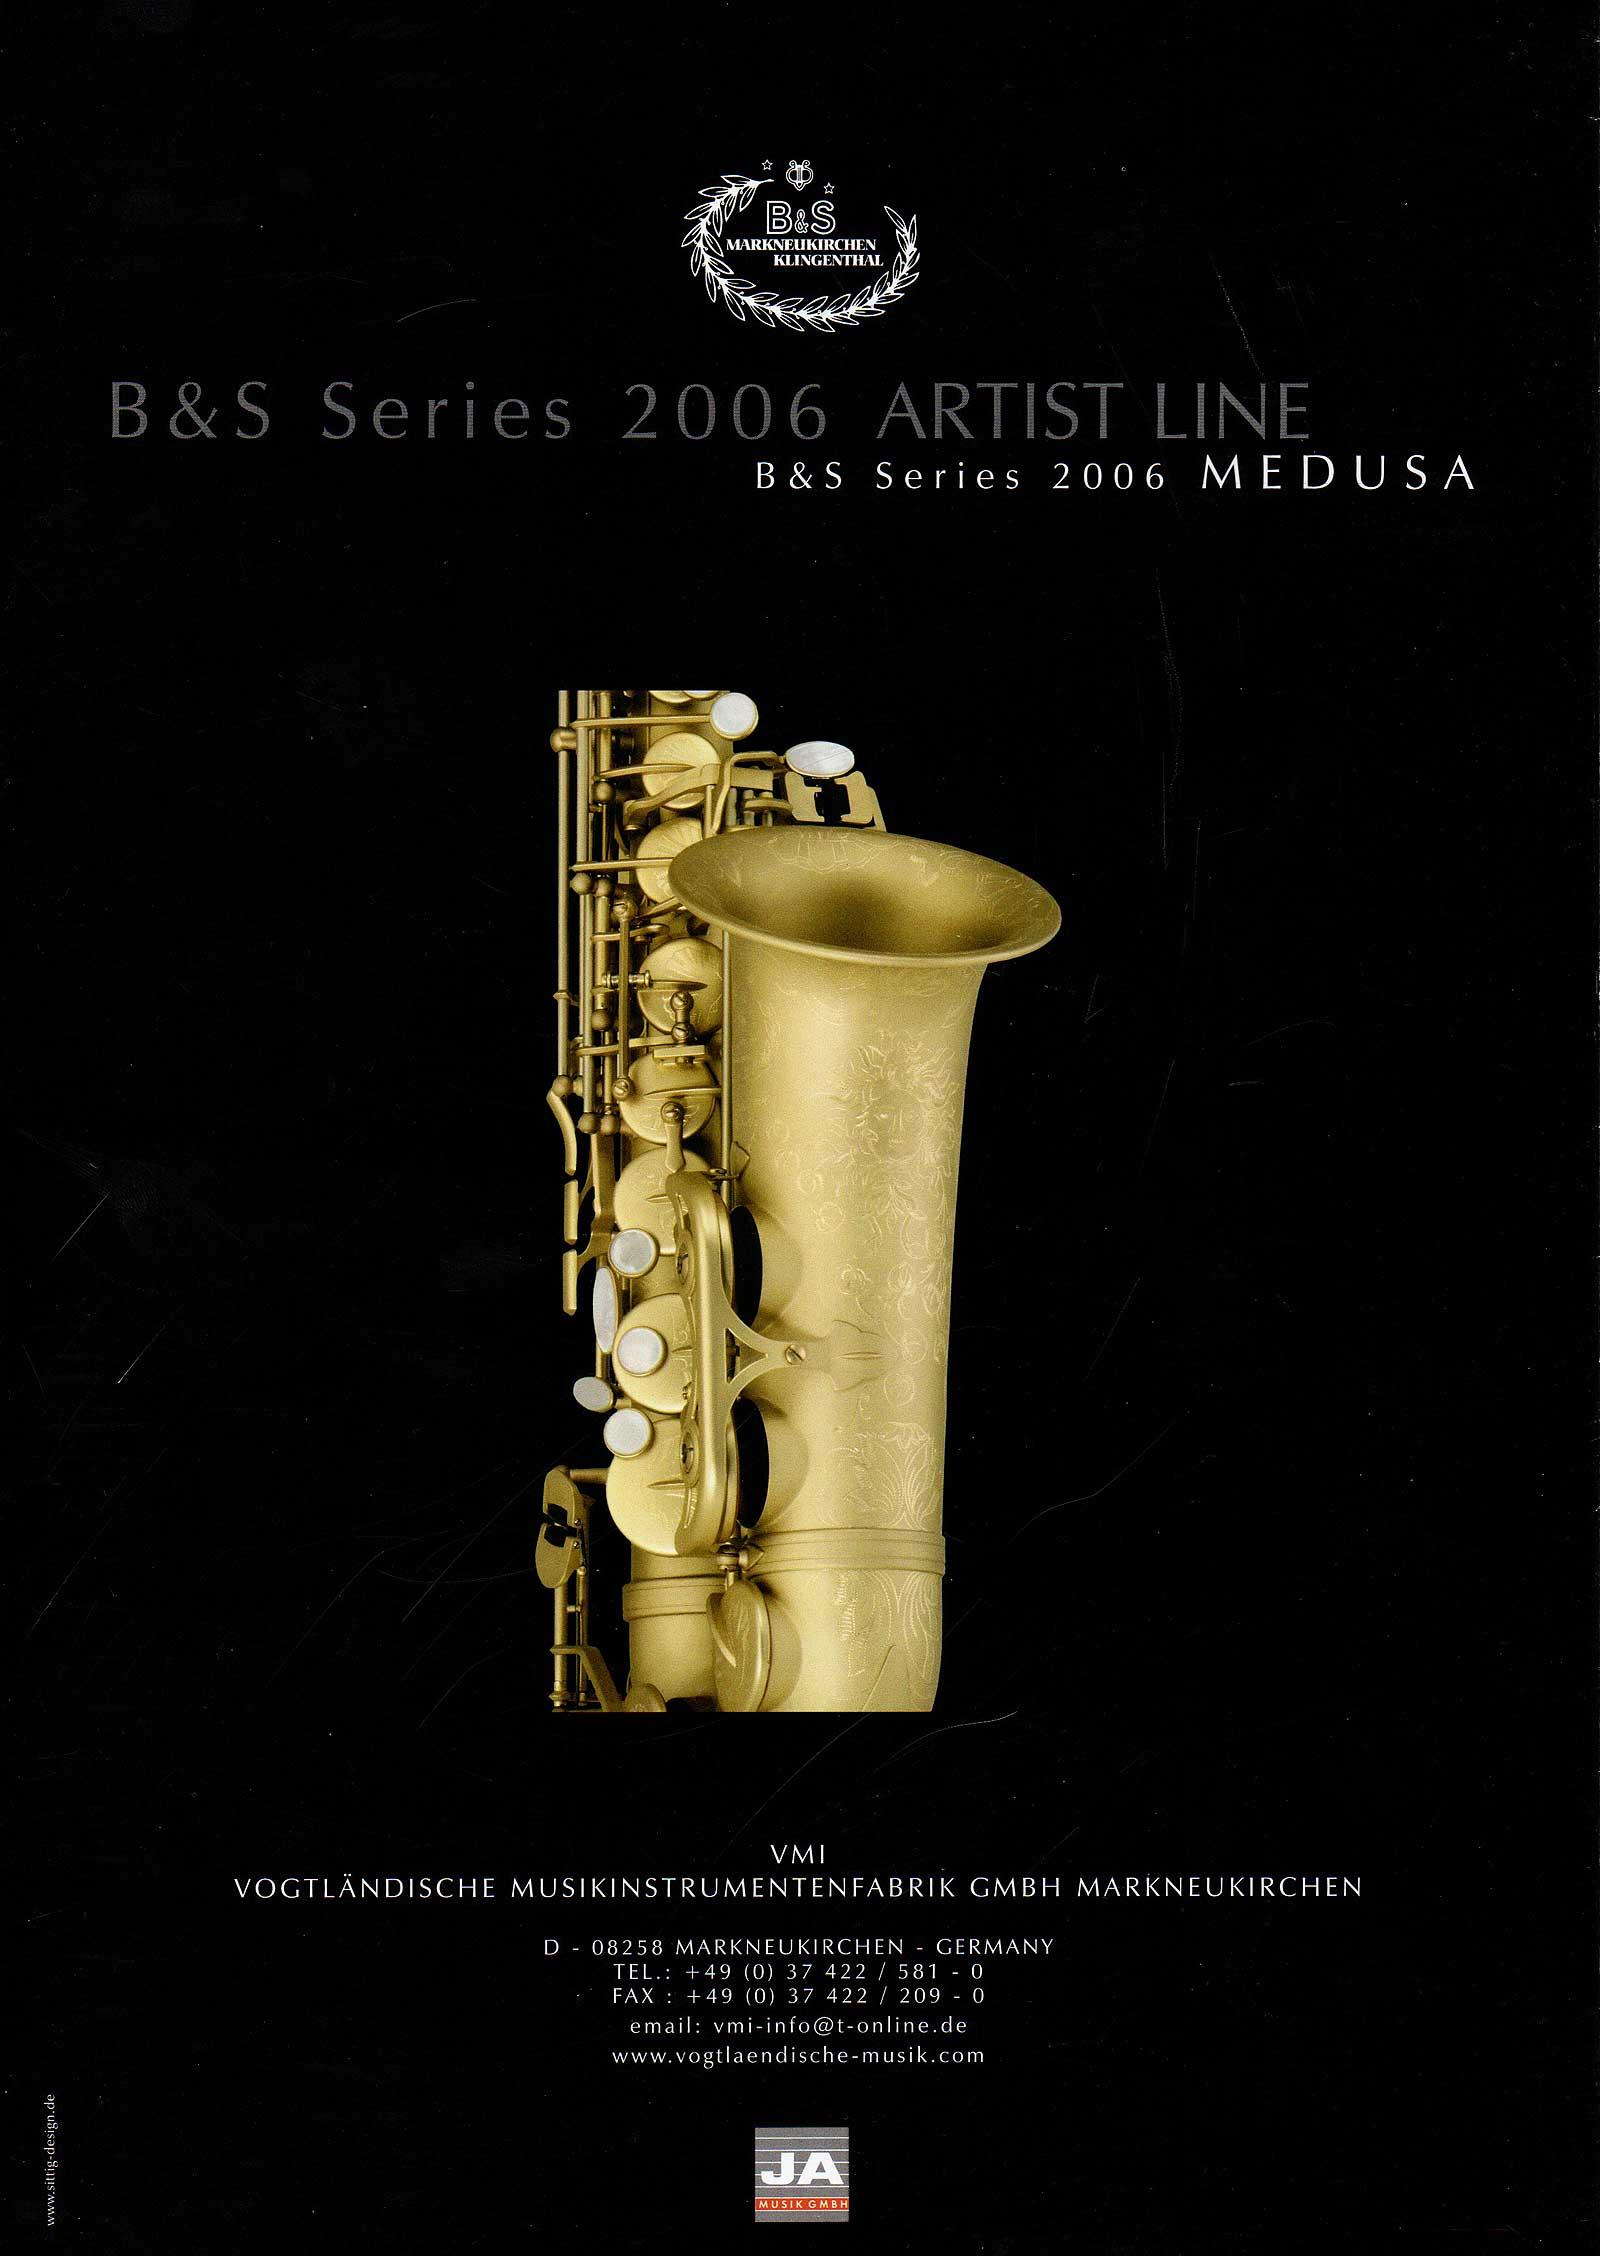 VMI, B&S Medusa saxophone, Series 2006 Medusa & Artist lines, saxophone brochure, German saxophone